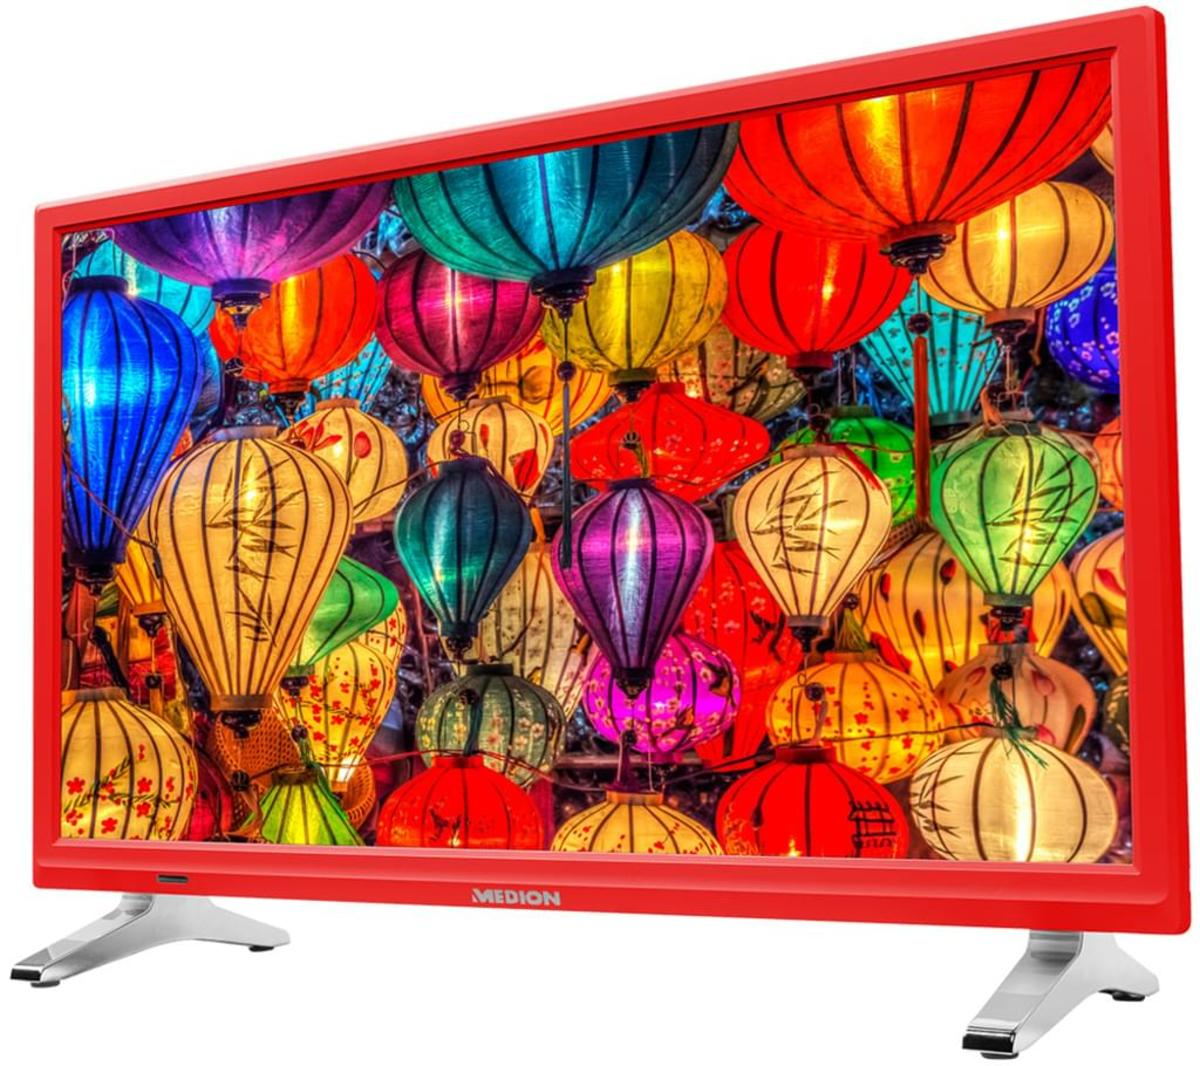 Bild 4 von Medion Life P12501 Full HD LED 54,6 cm (21,5 Zoll) inklusive DVD Player, Triple Tuner, Rot